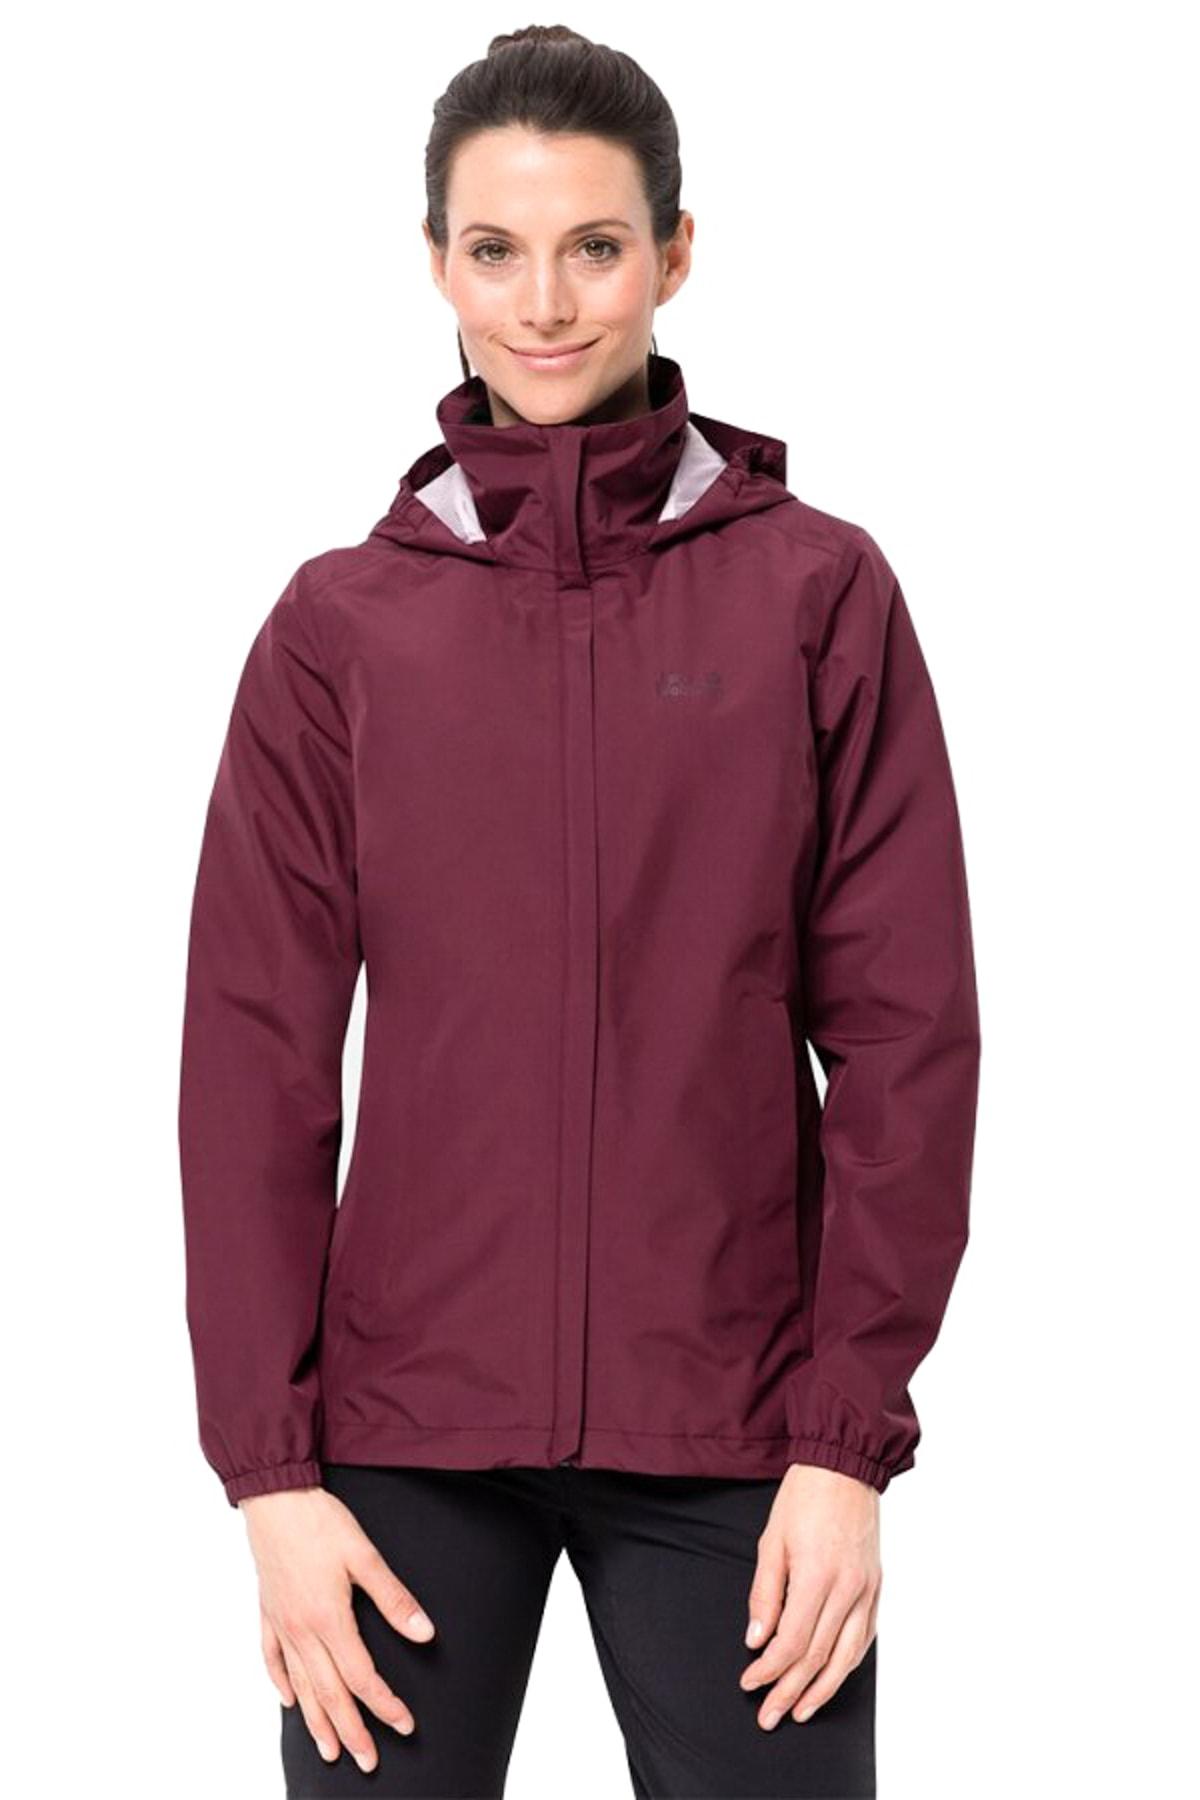 Jack Wolfskin Stormy Point Jacket Kadın Ceket - 1111201-2740 2